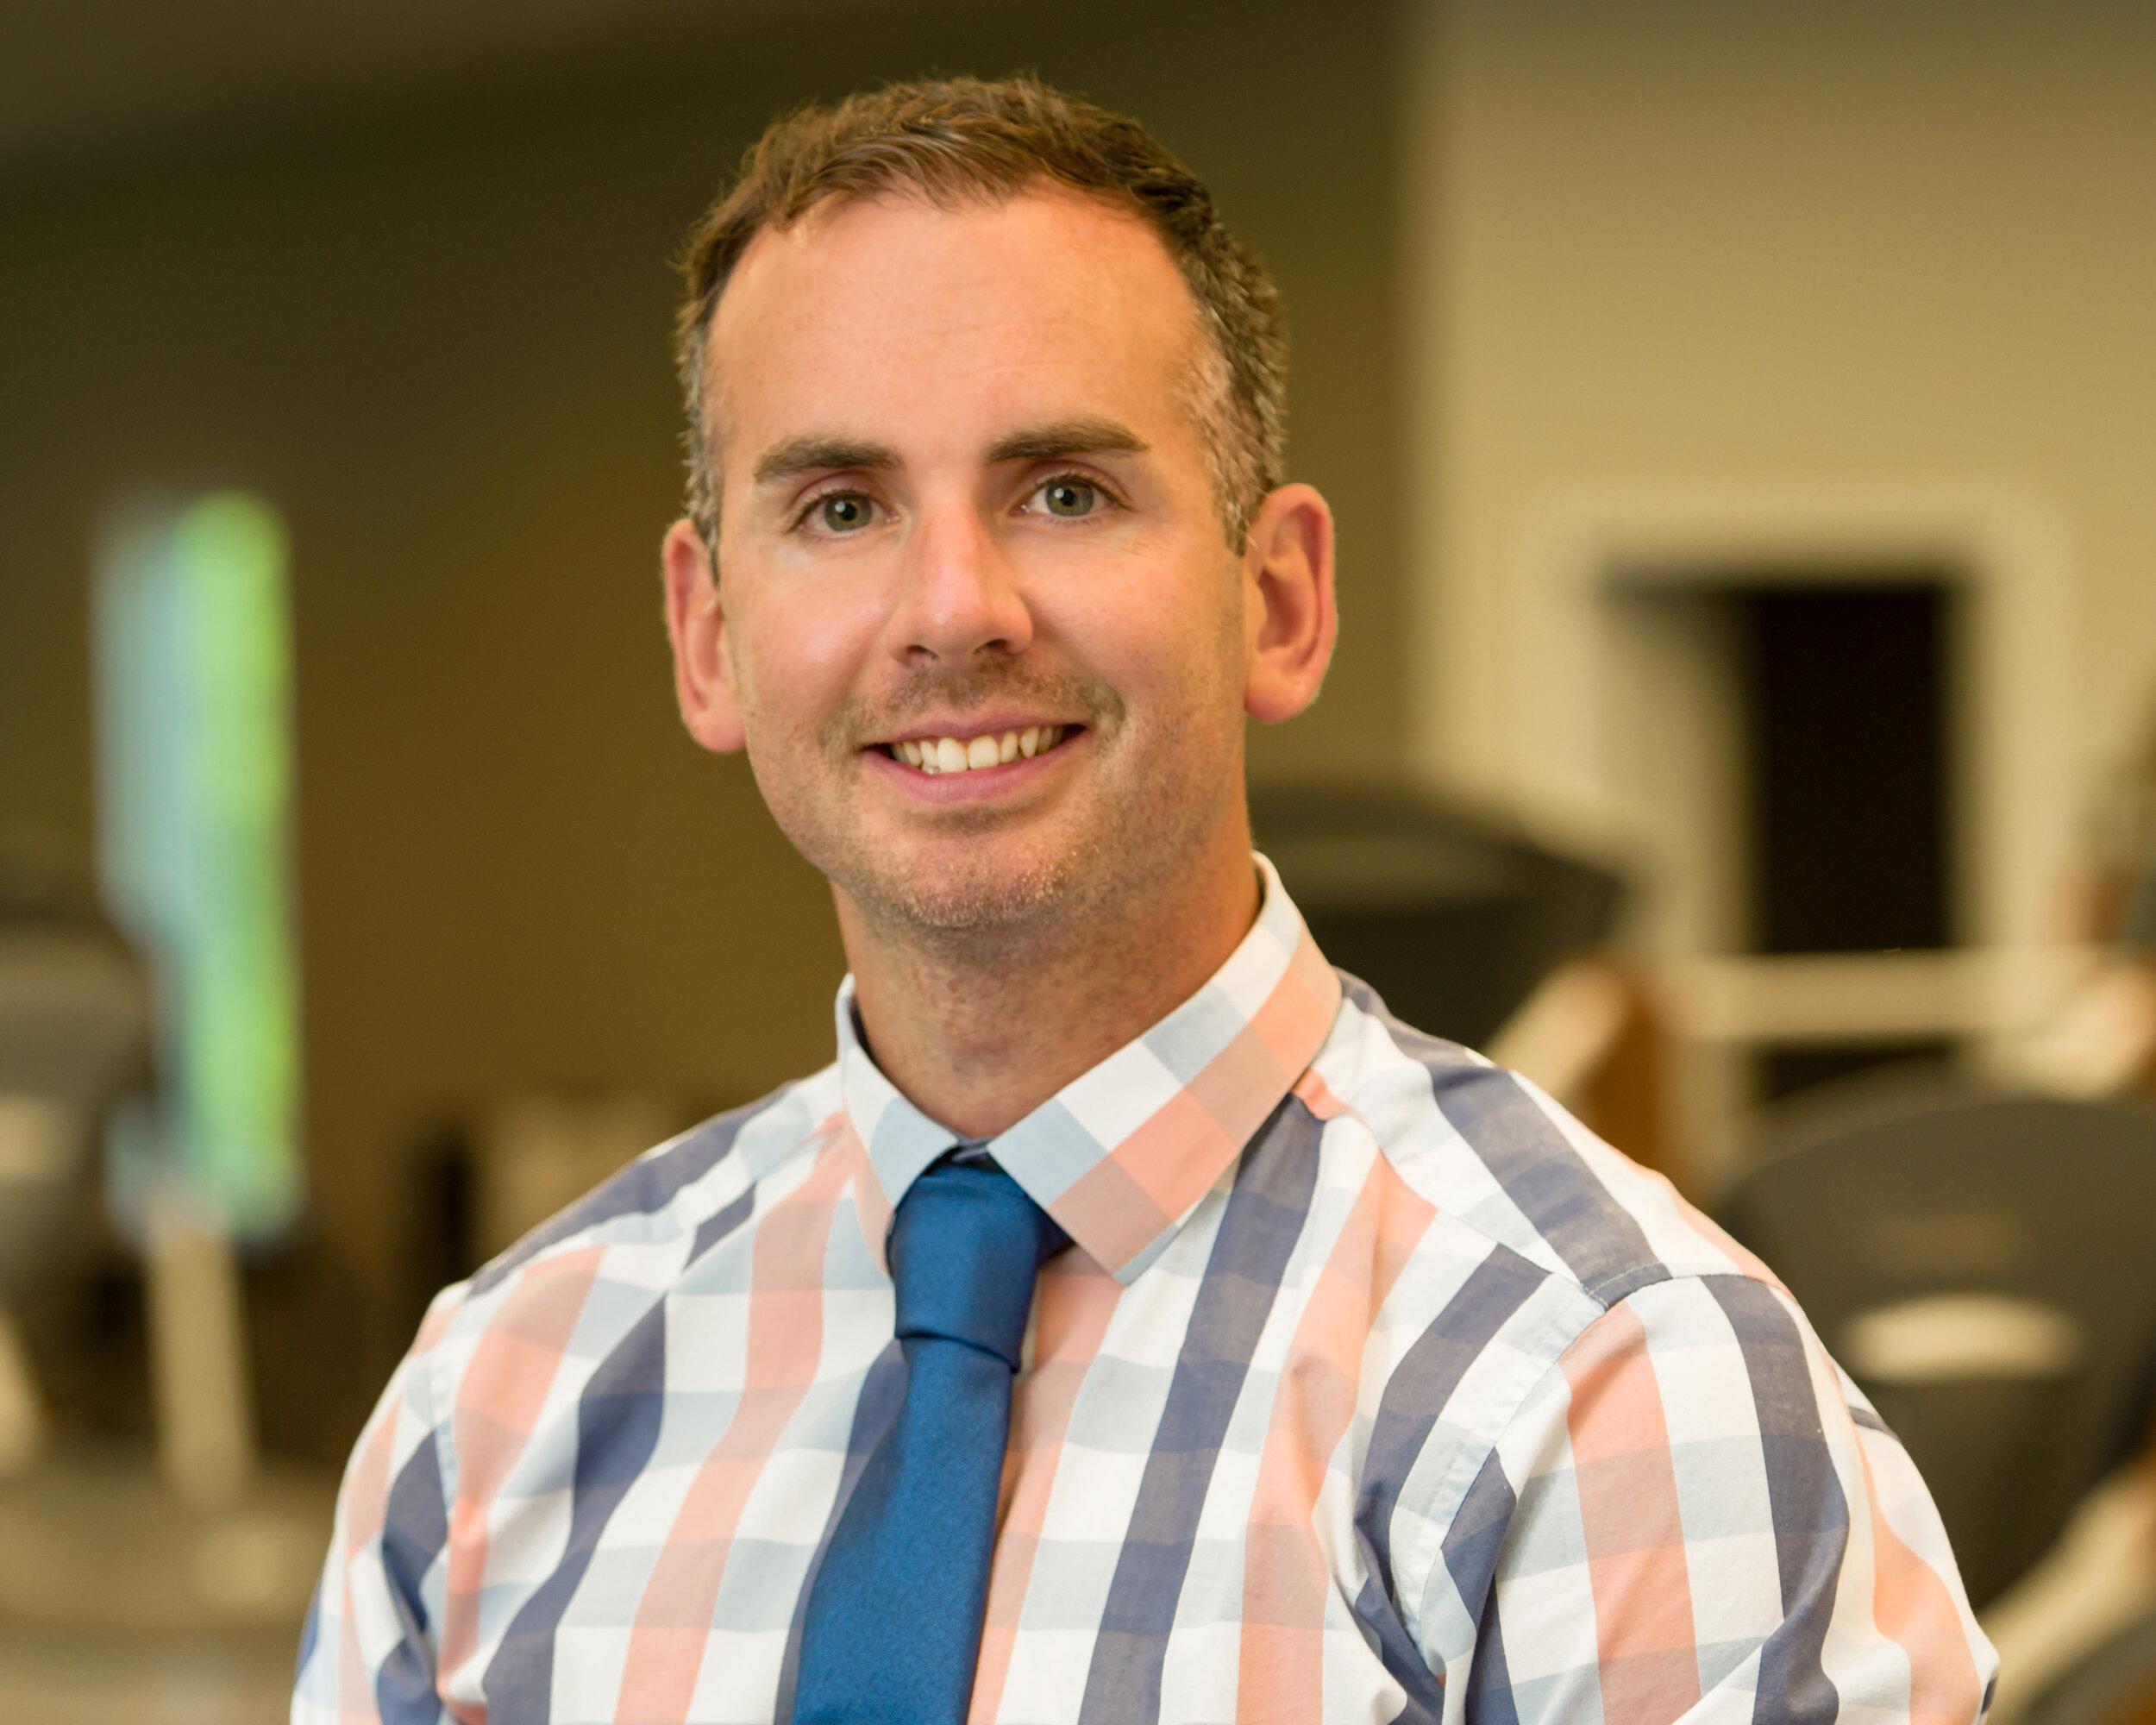 justin mcevoy - PT, DPT, Clinical Director